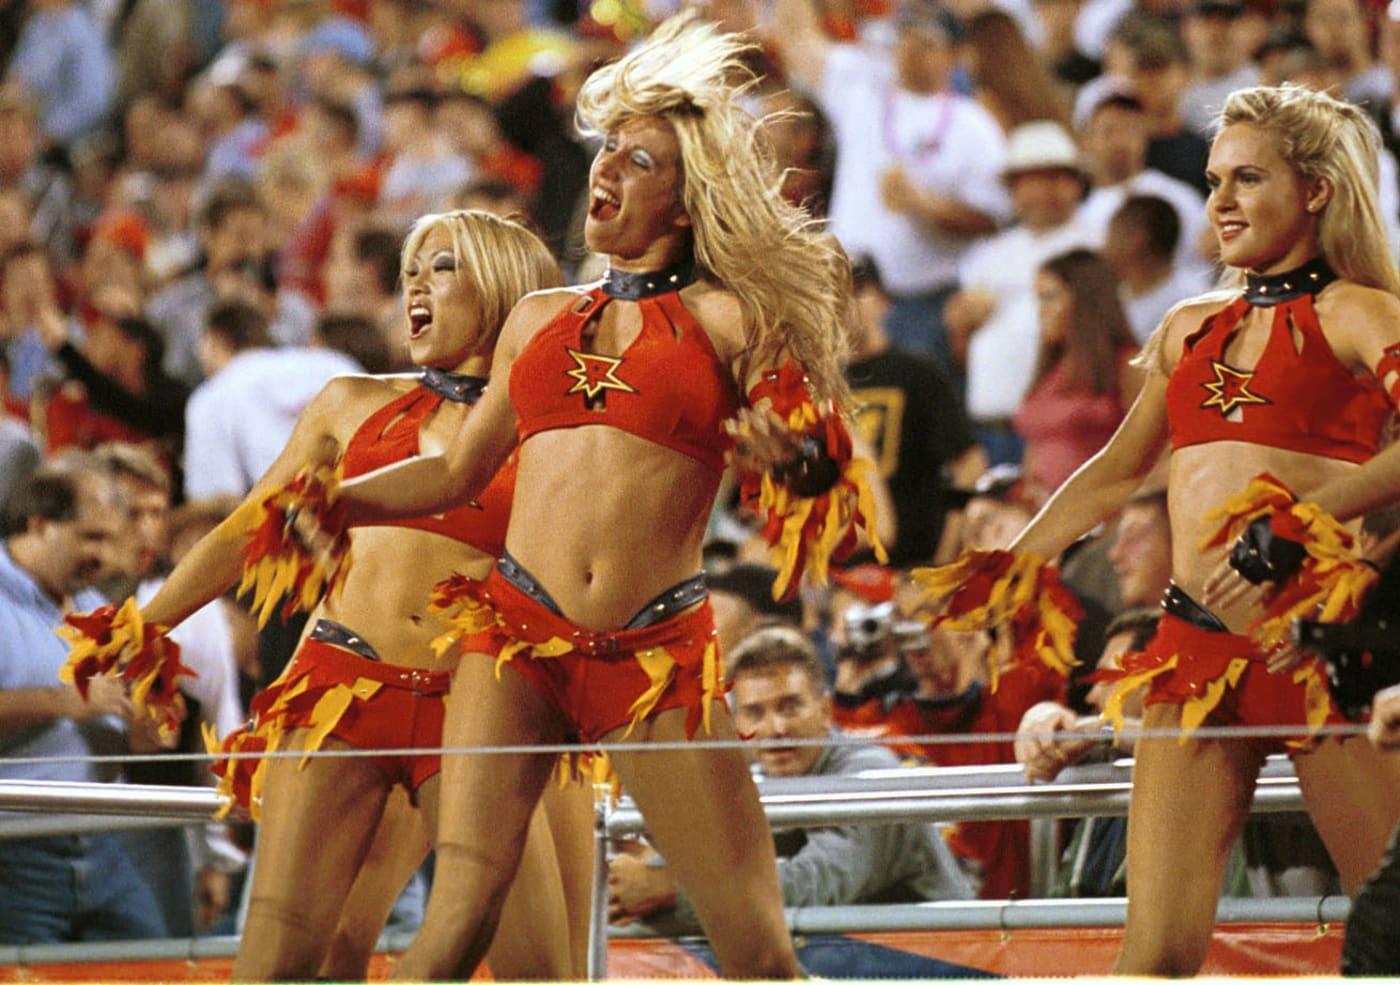 XFL Cheerleaders Rage 2001